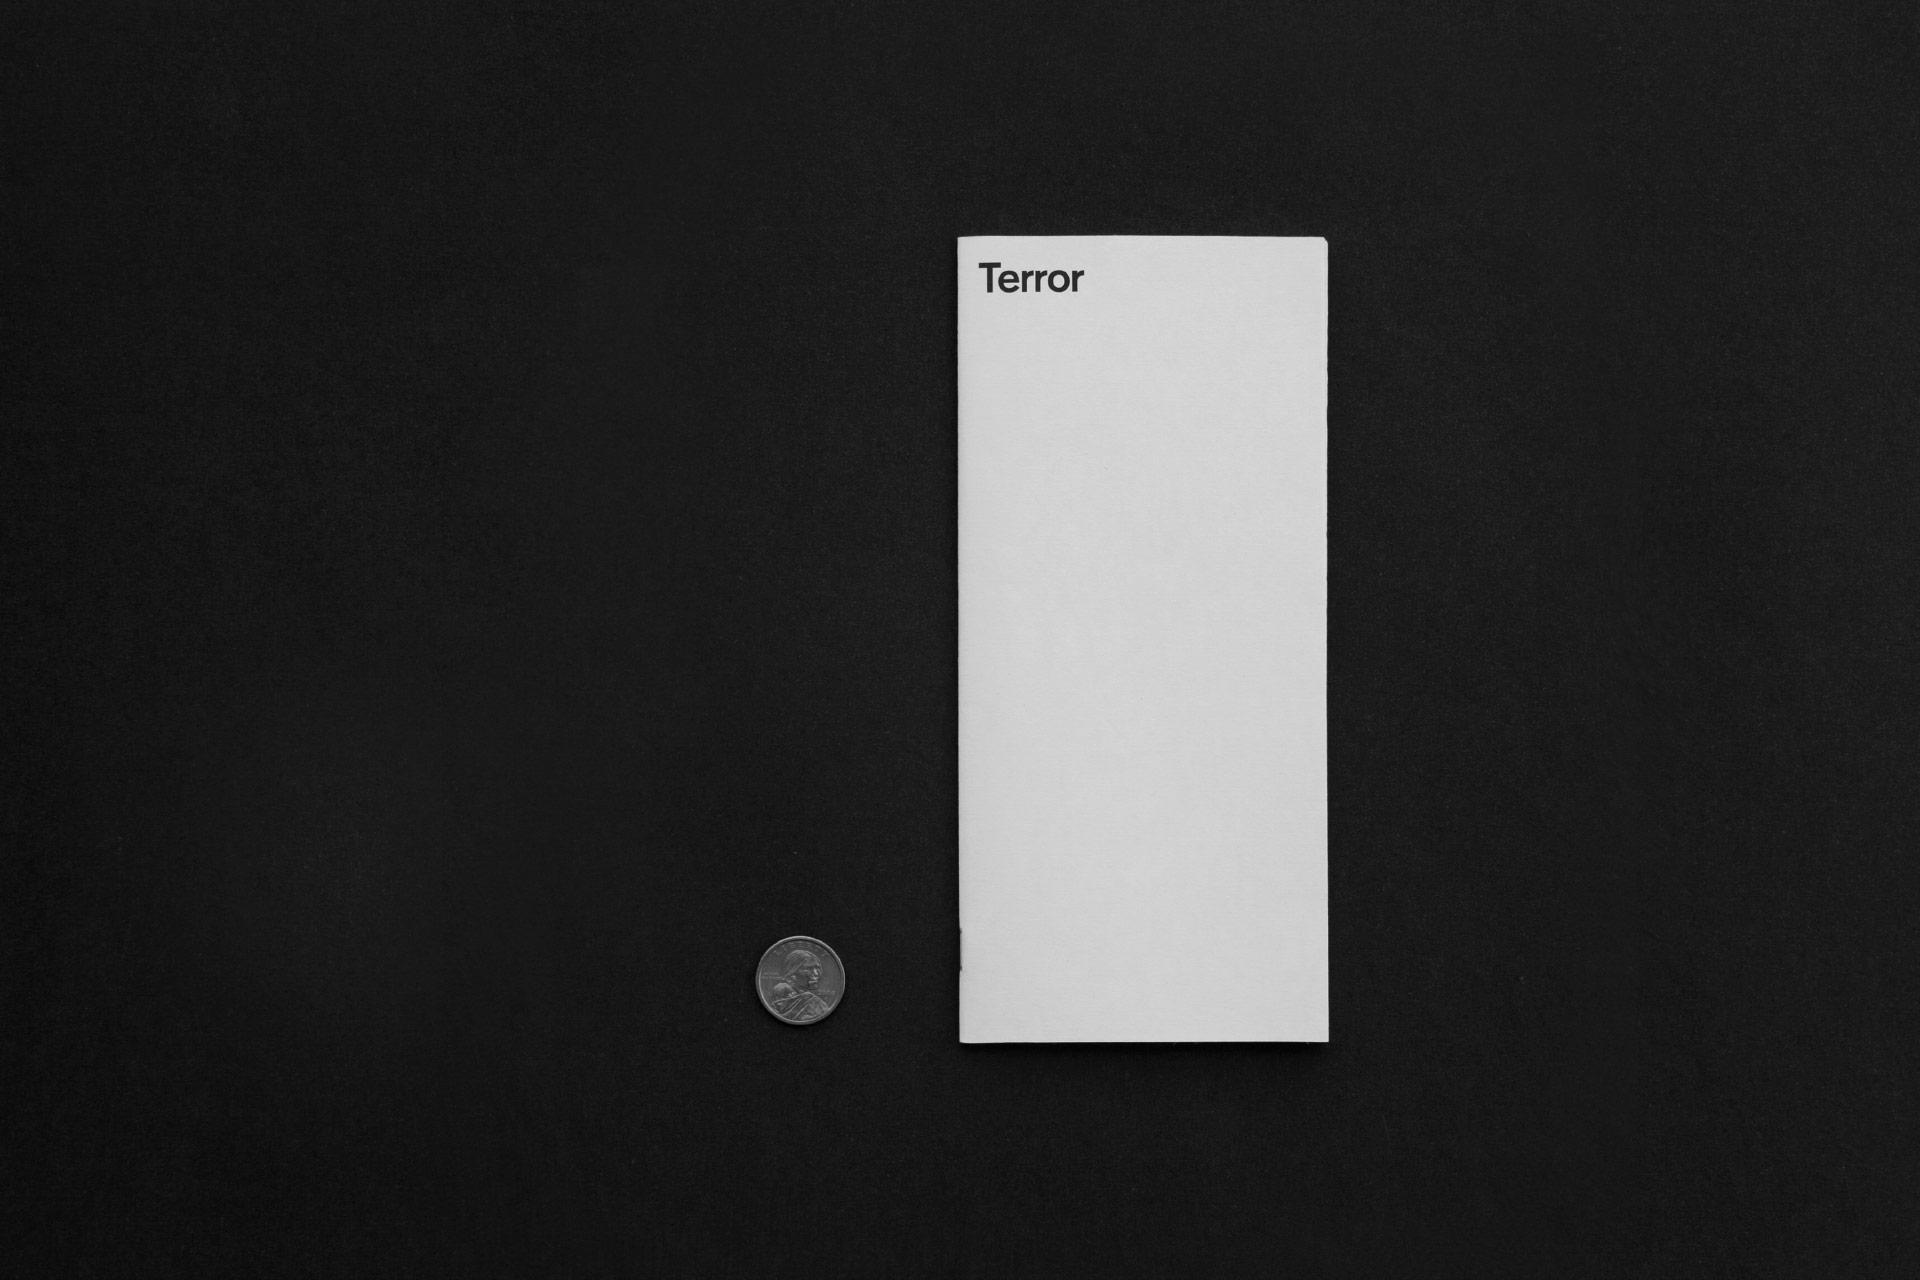 kitschic-terror-01